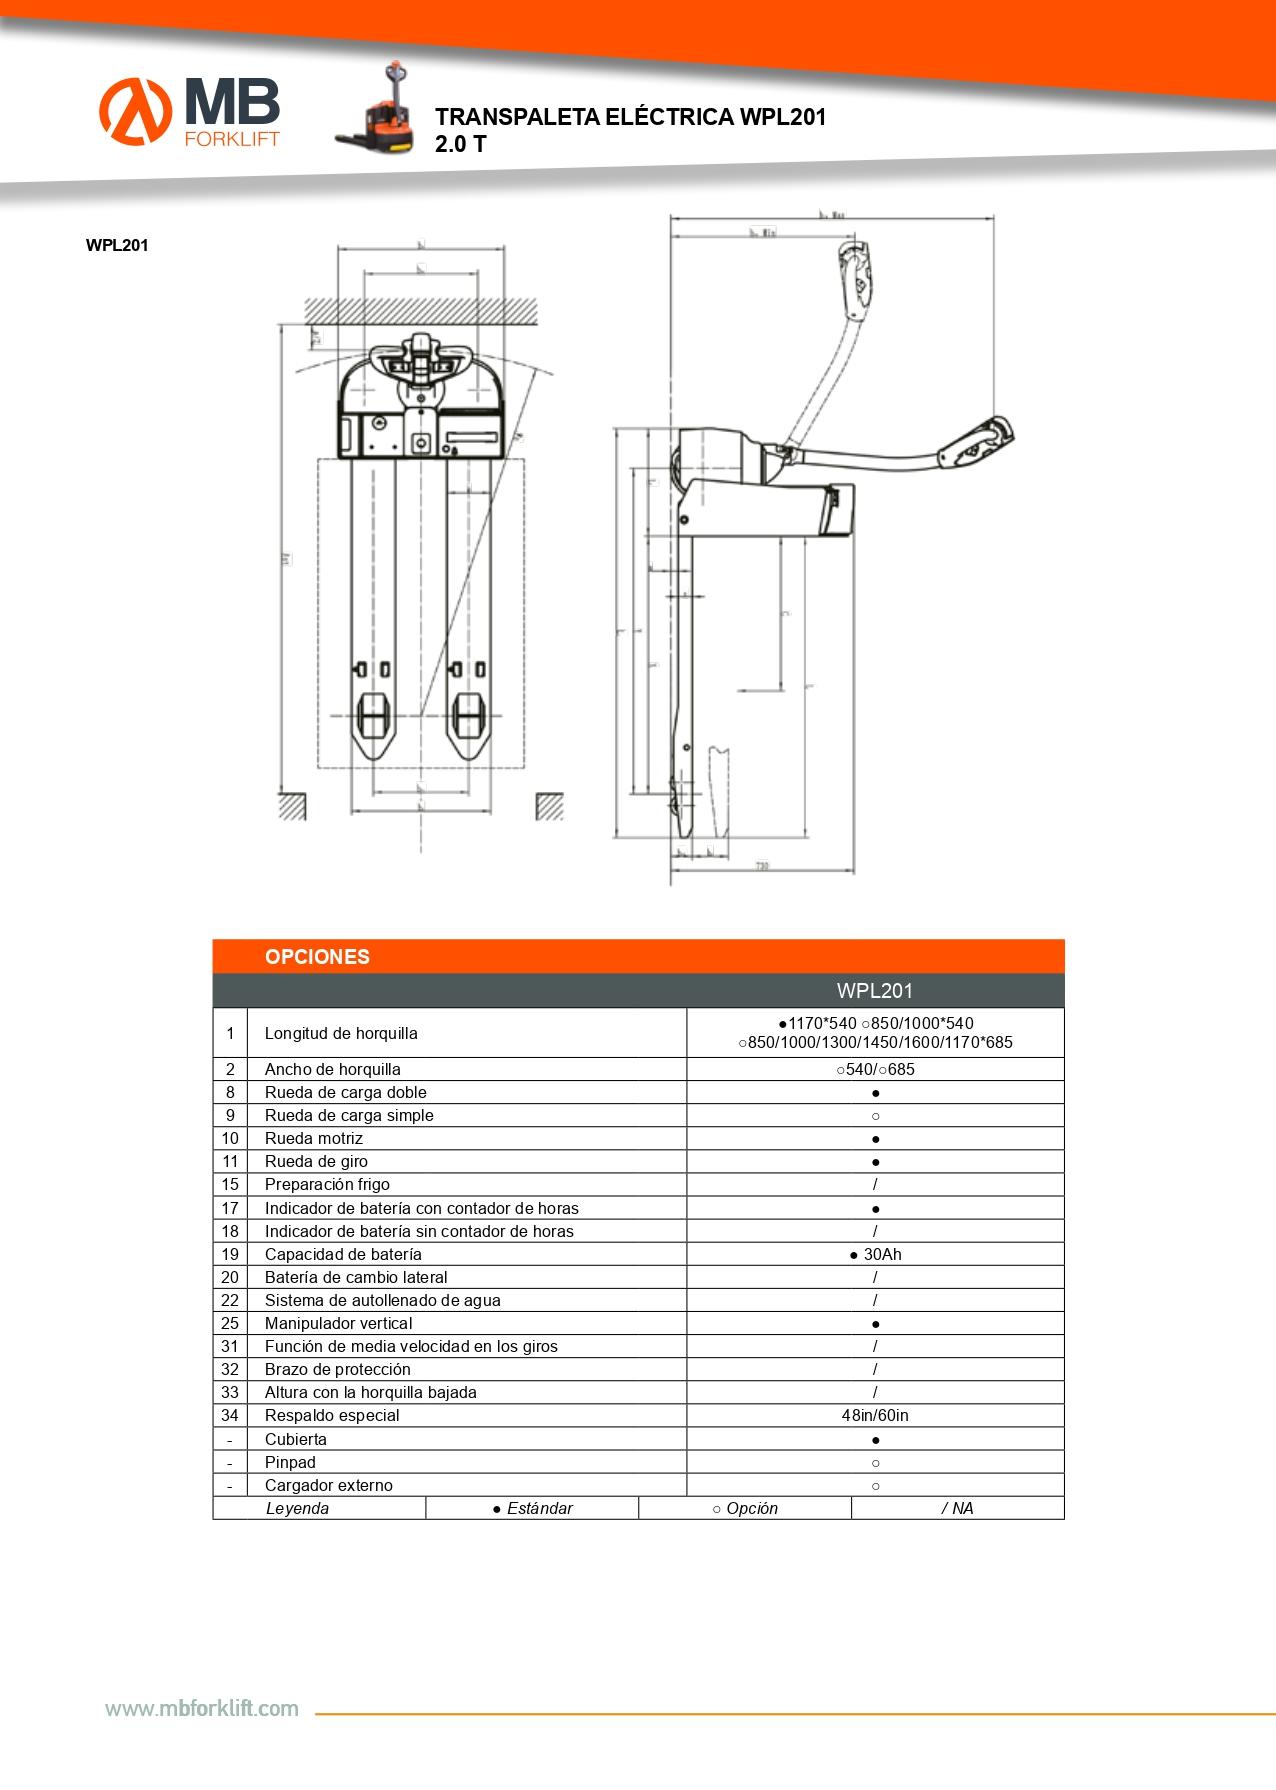 caracteristicas-tecnicas-transpaleta-electrica-litio-2000-kg